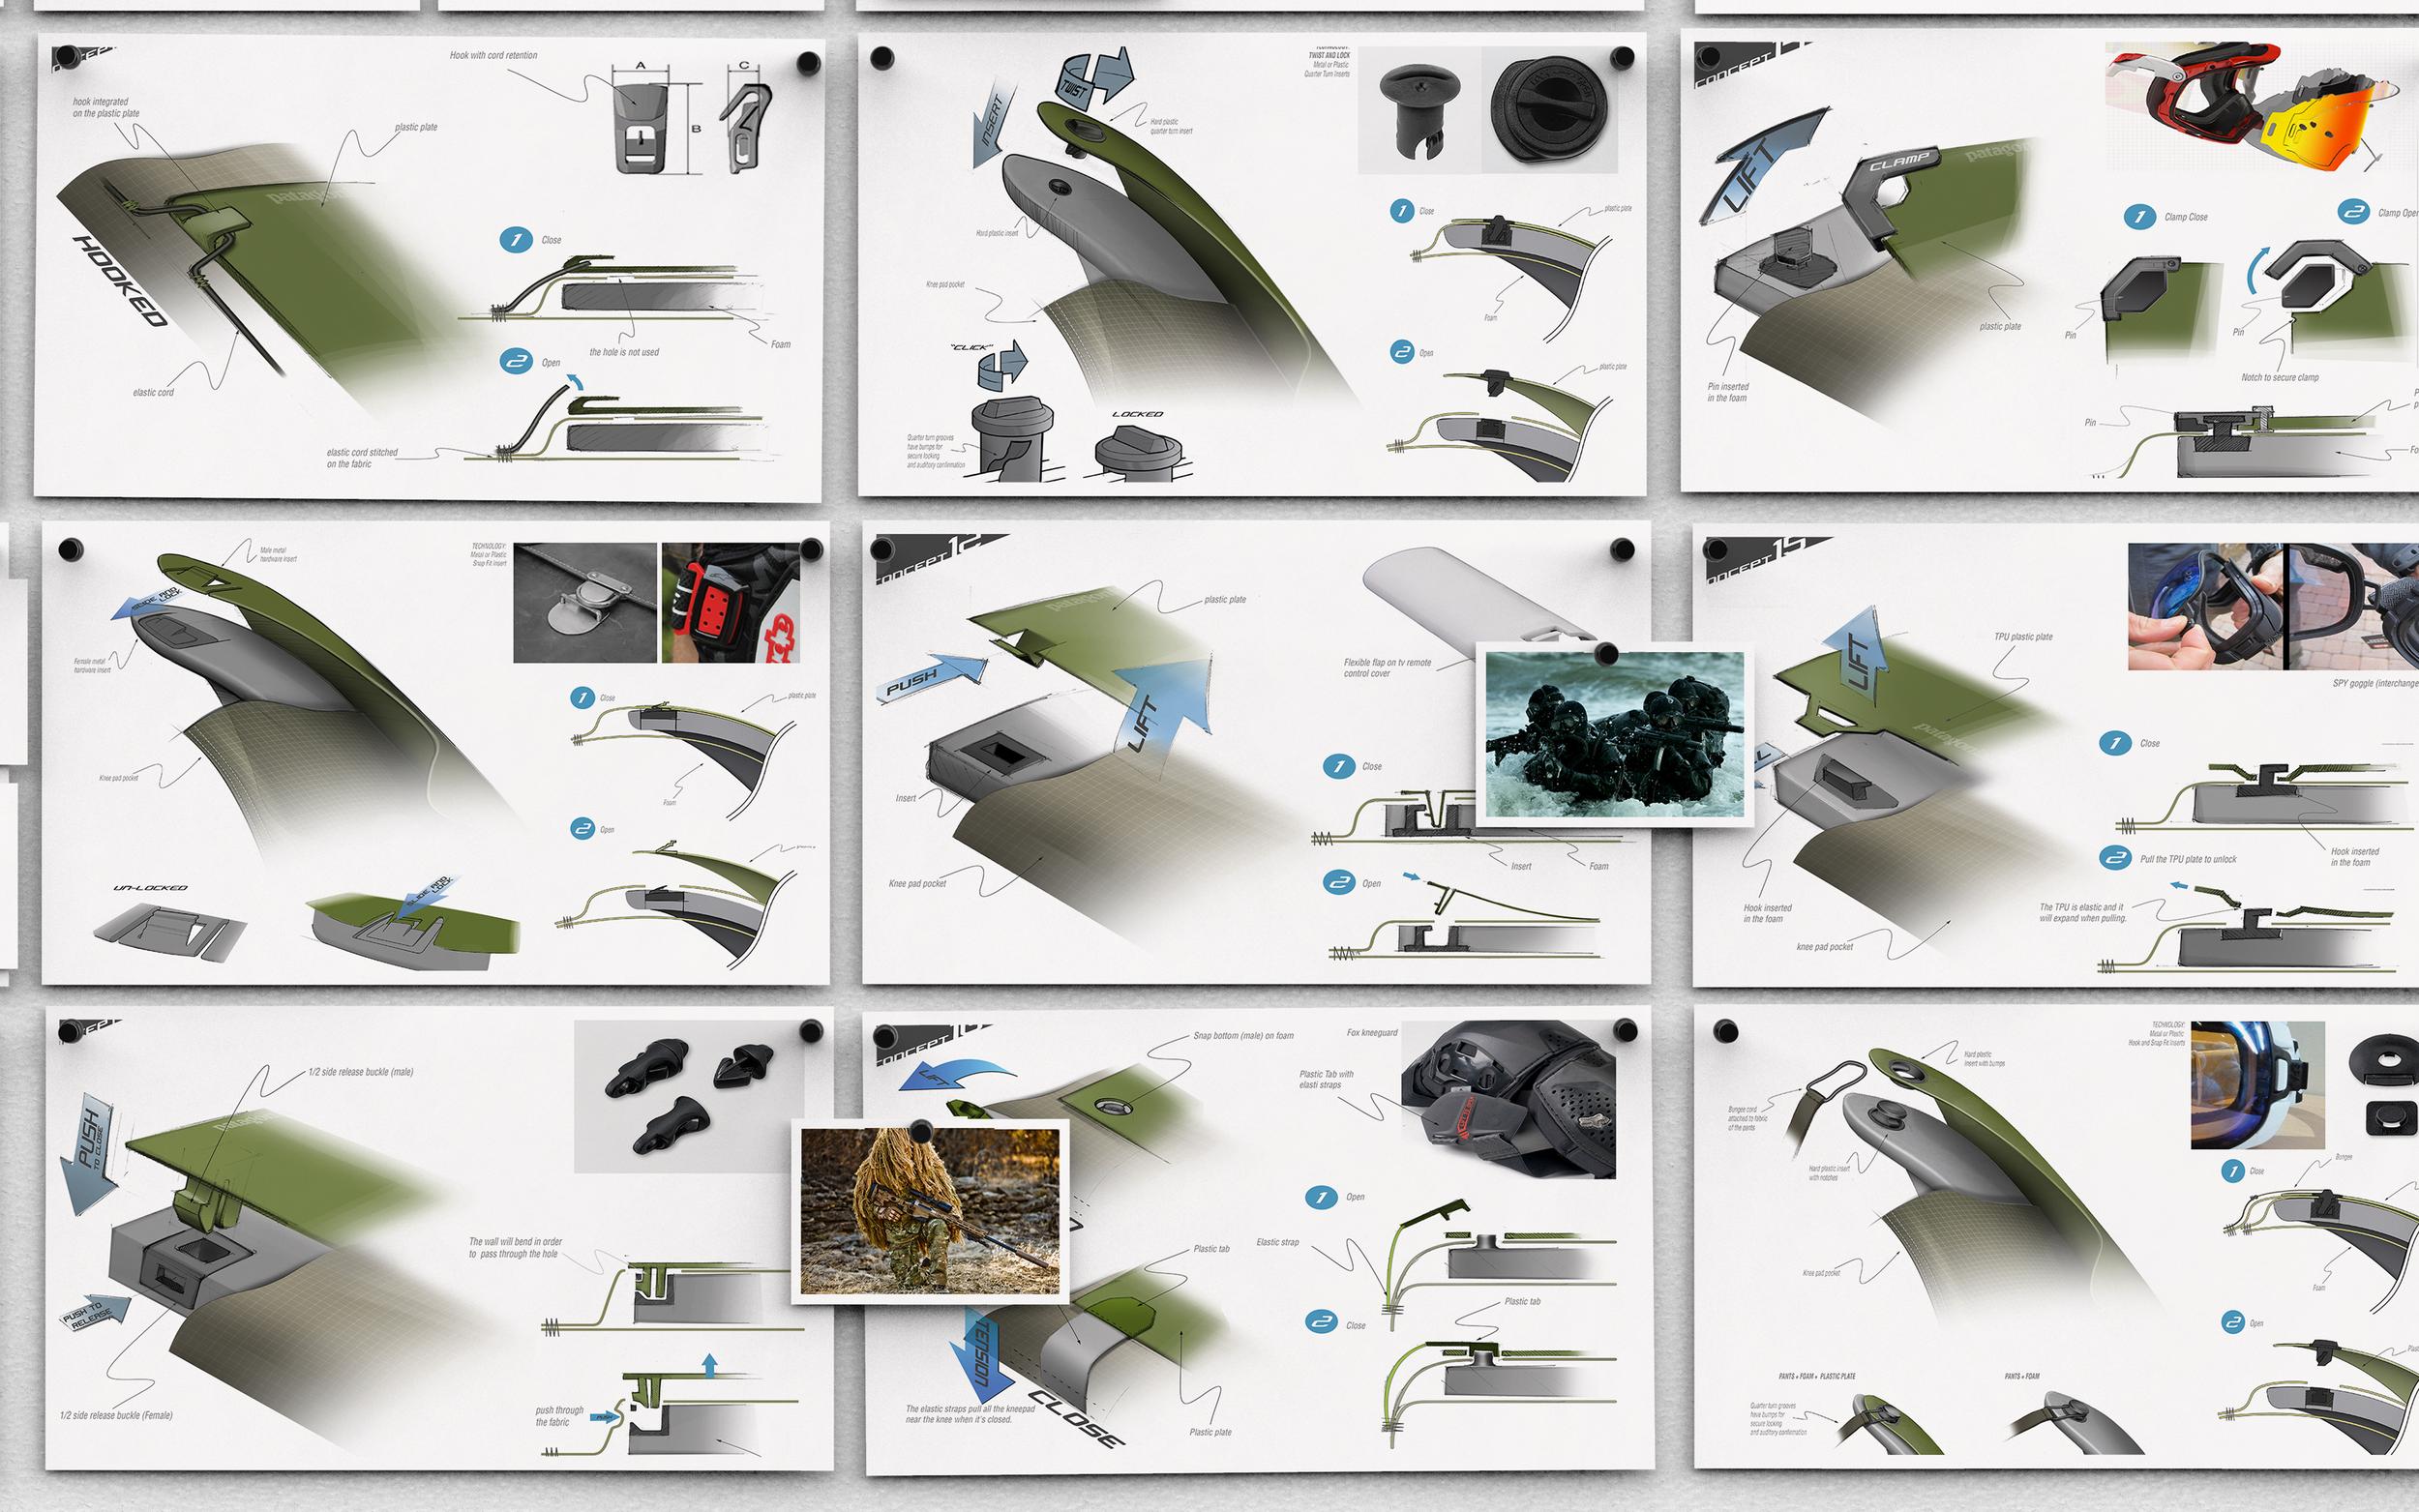 Patagonia - Knee Pad - wall collage - V01.png